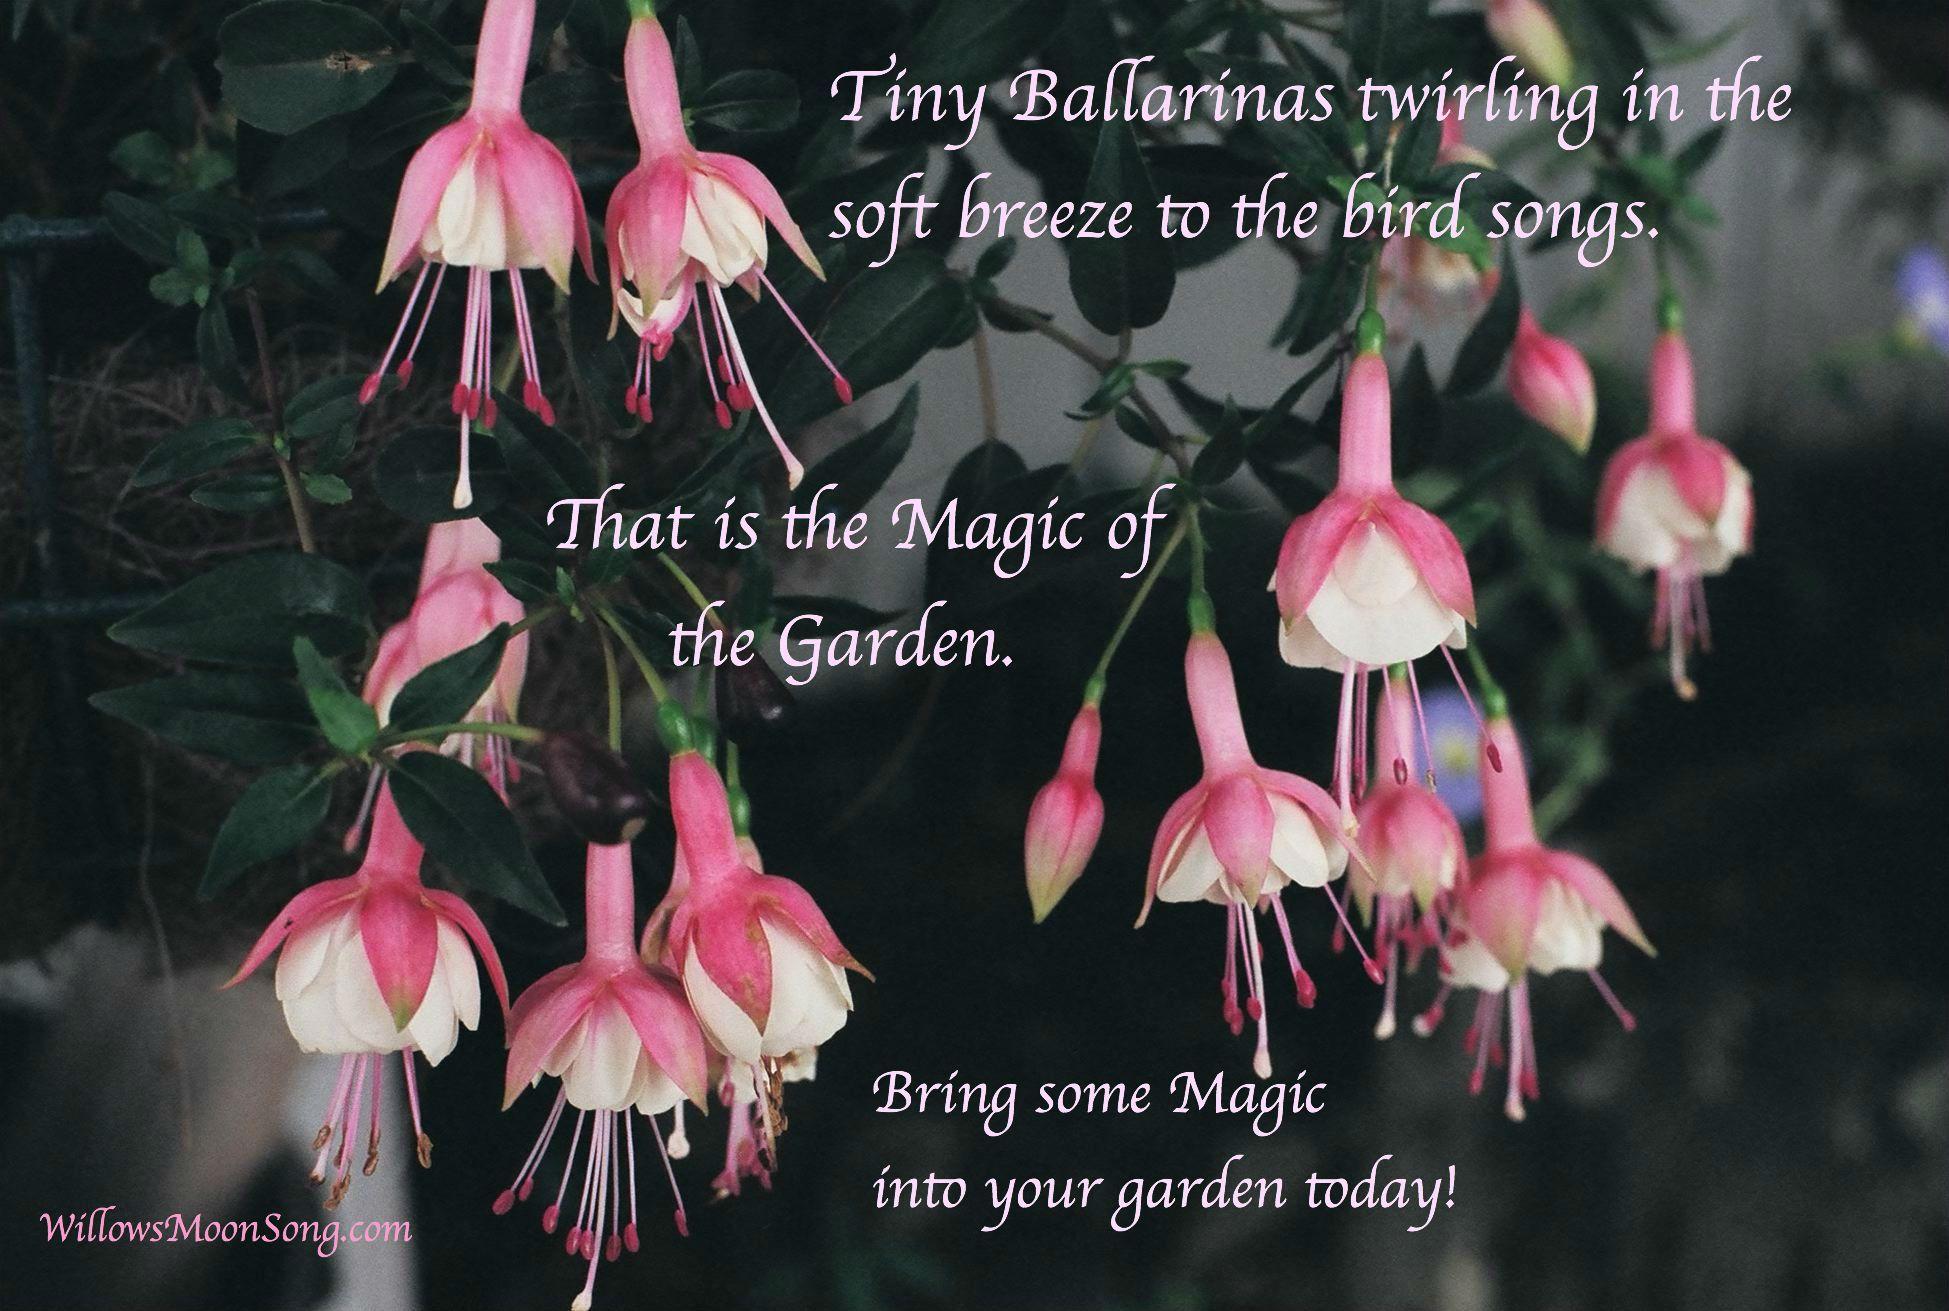 Fuchsia Flowers And Magical Gardens Archeratwood Com Willowsmoonsong Com Fuchsia Flowers Magical Garden Hanging Plants